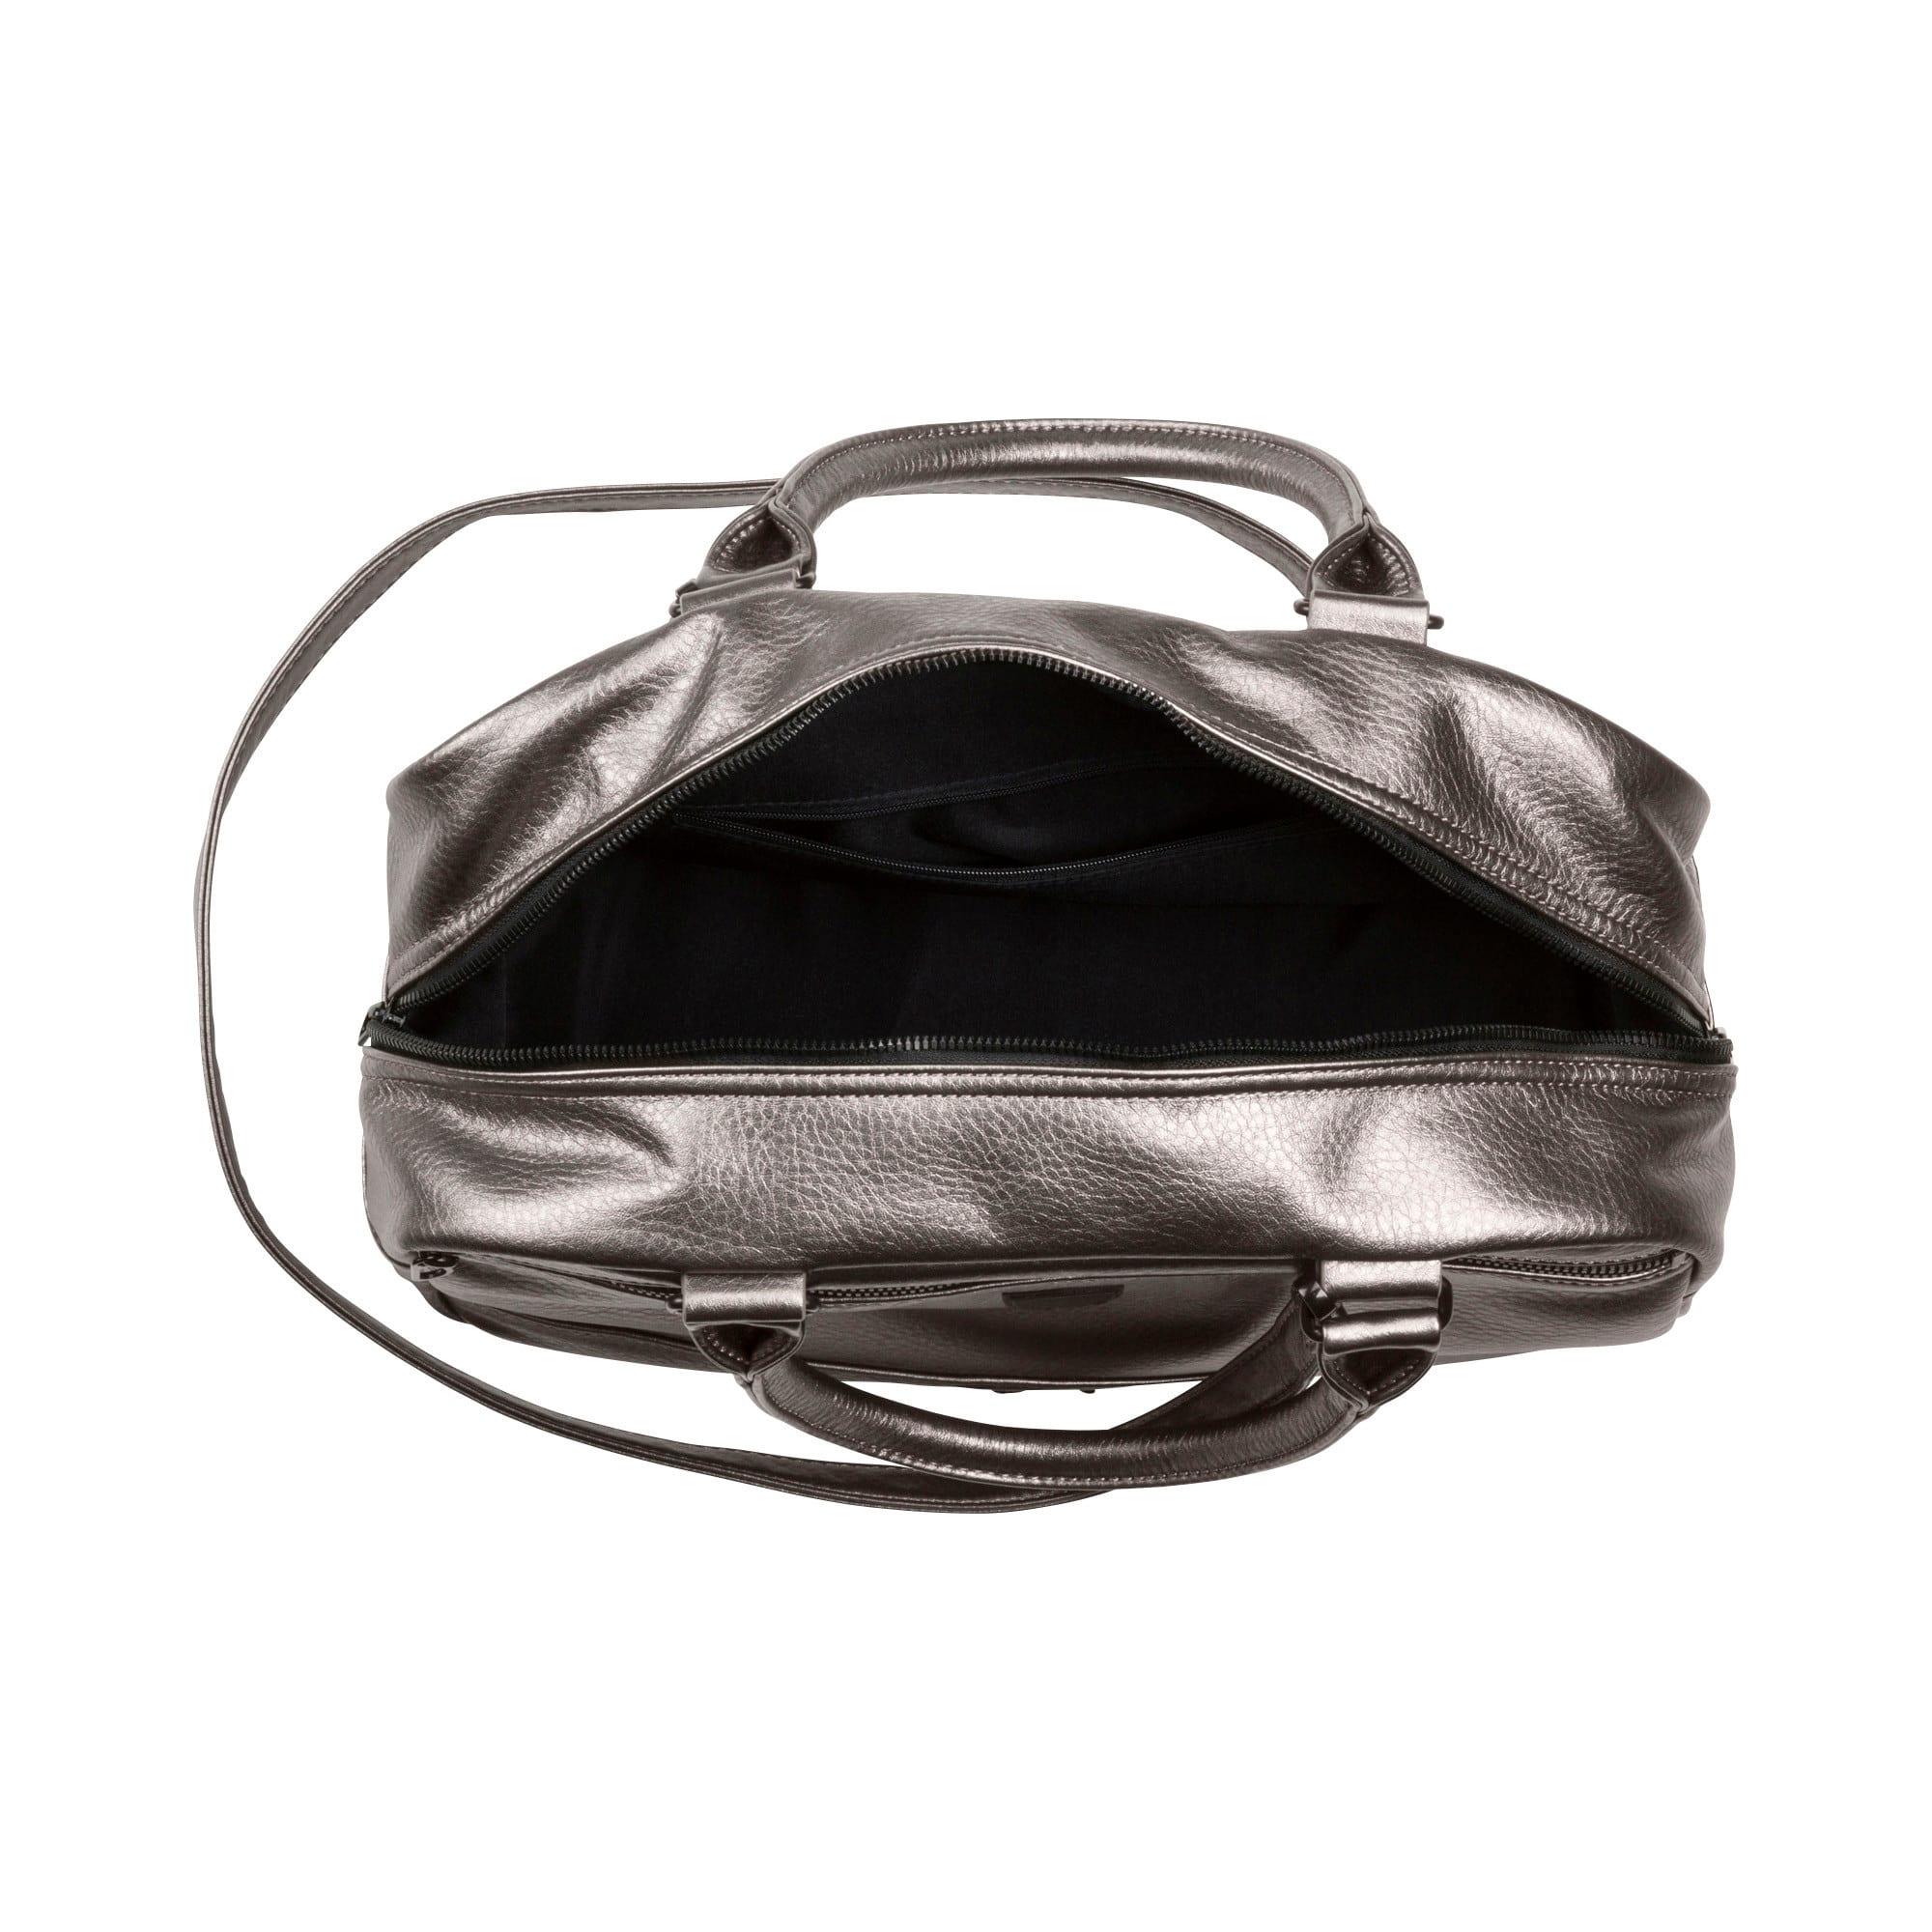 Thumbnail 3 of SF LS Handbag Metallic Ash, Metallic Ash, medium-IND